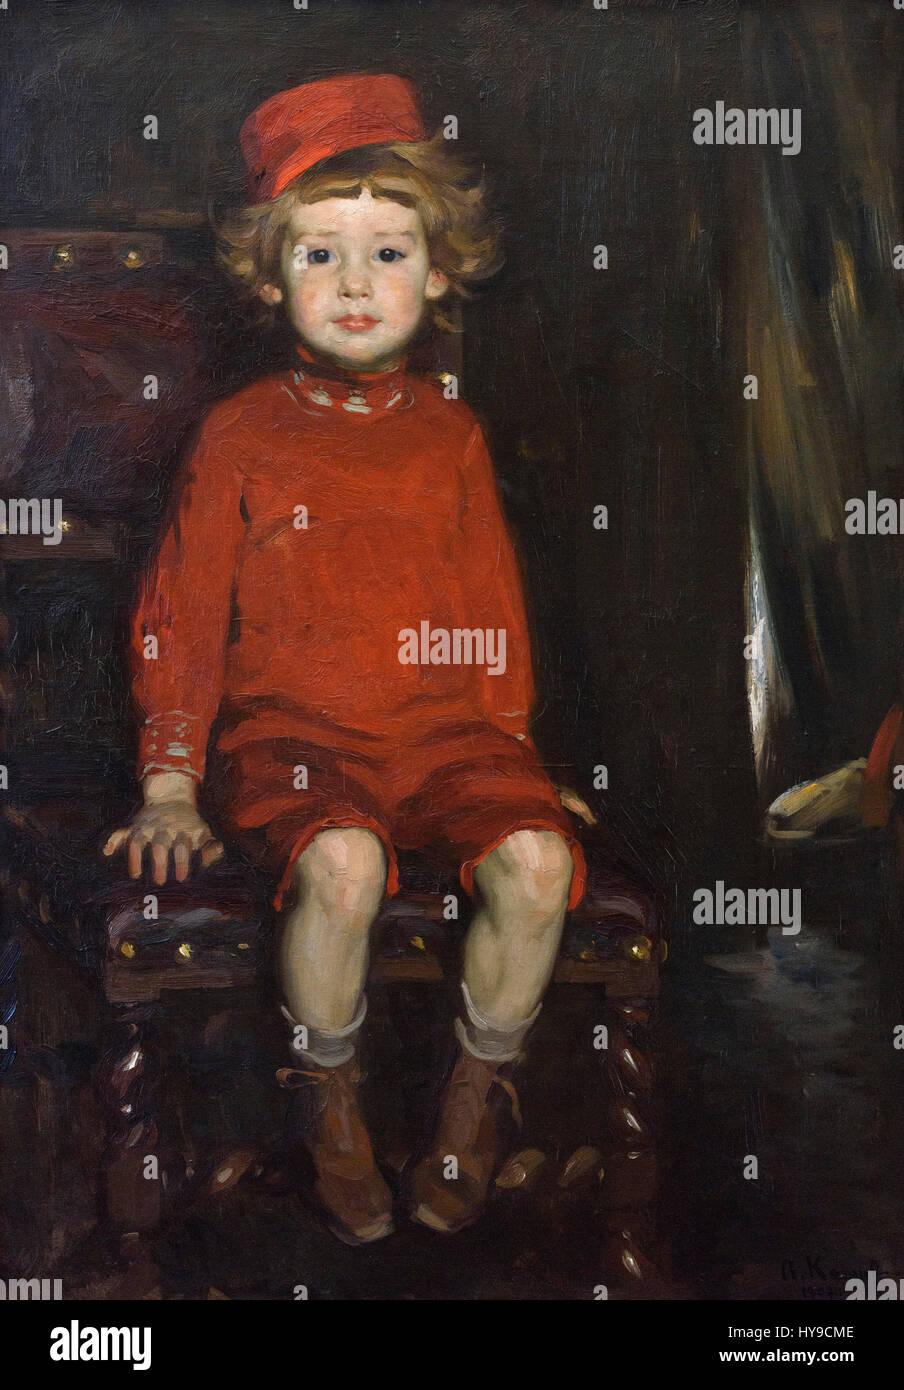 Arthur Kampf (1864-1950), Boy in Red, 1907. Knabe in Rot. - Stock Image